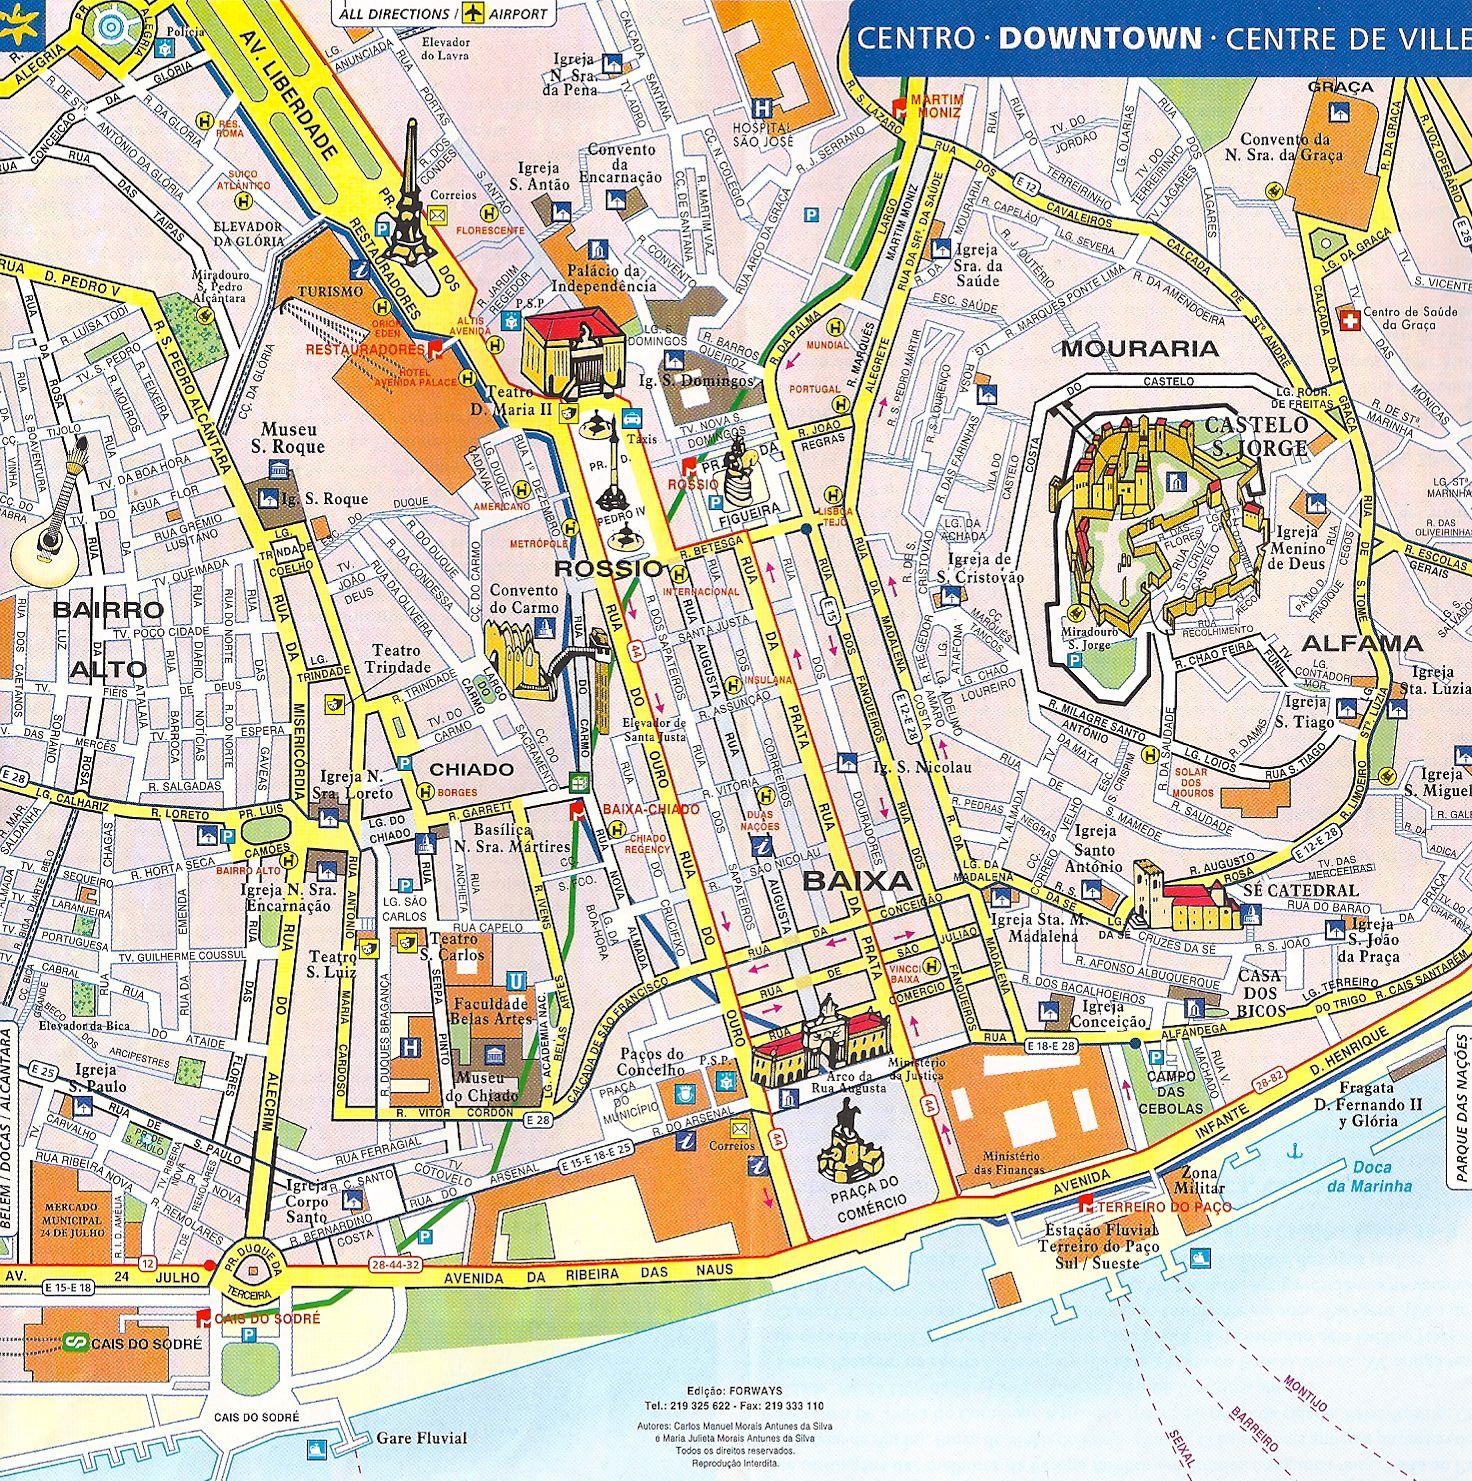 Lissabon Lissabon Lissabon Karte Portugal Lissabon